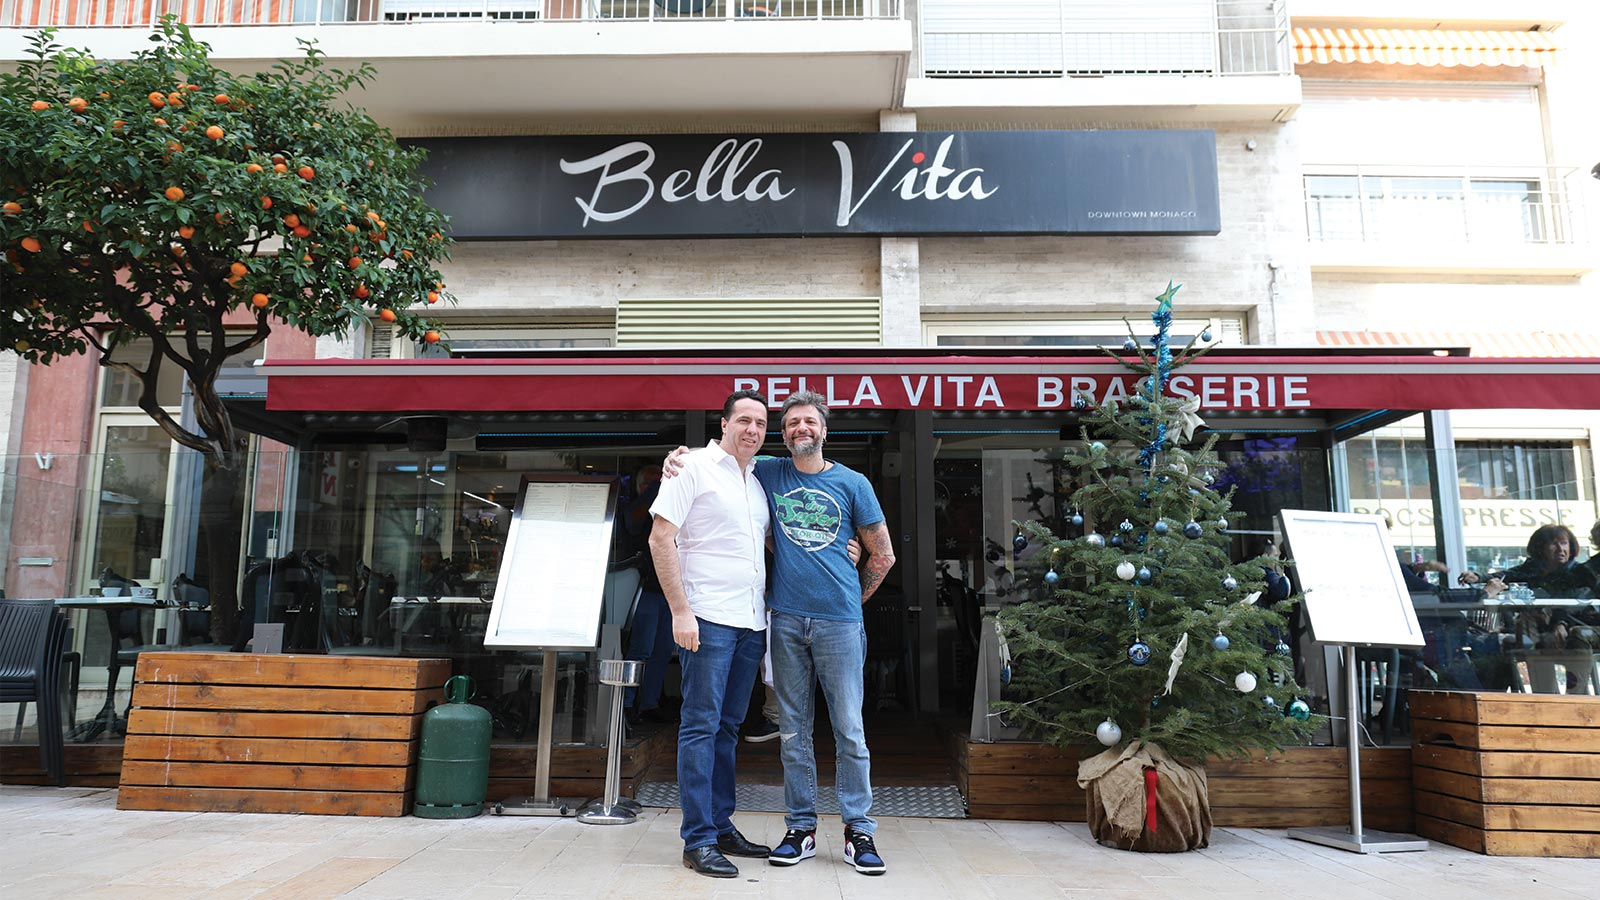 Bella Vita. <br/>Les meilleures saveurs de l'Italie